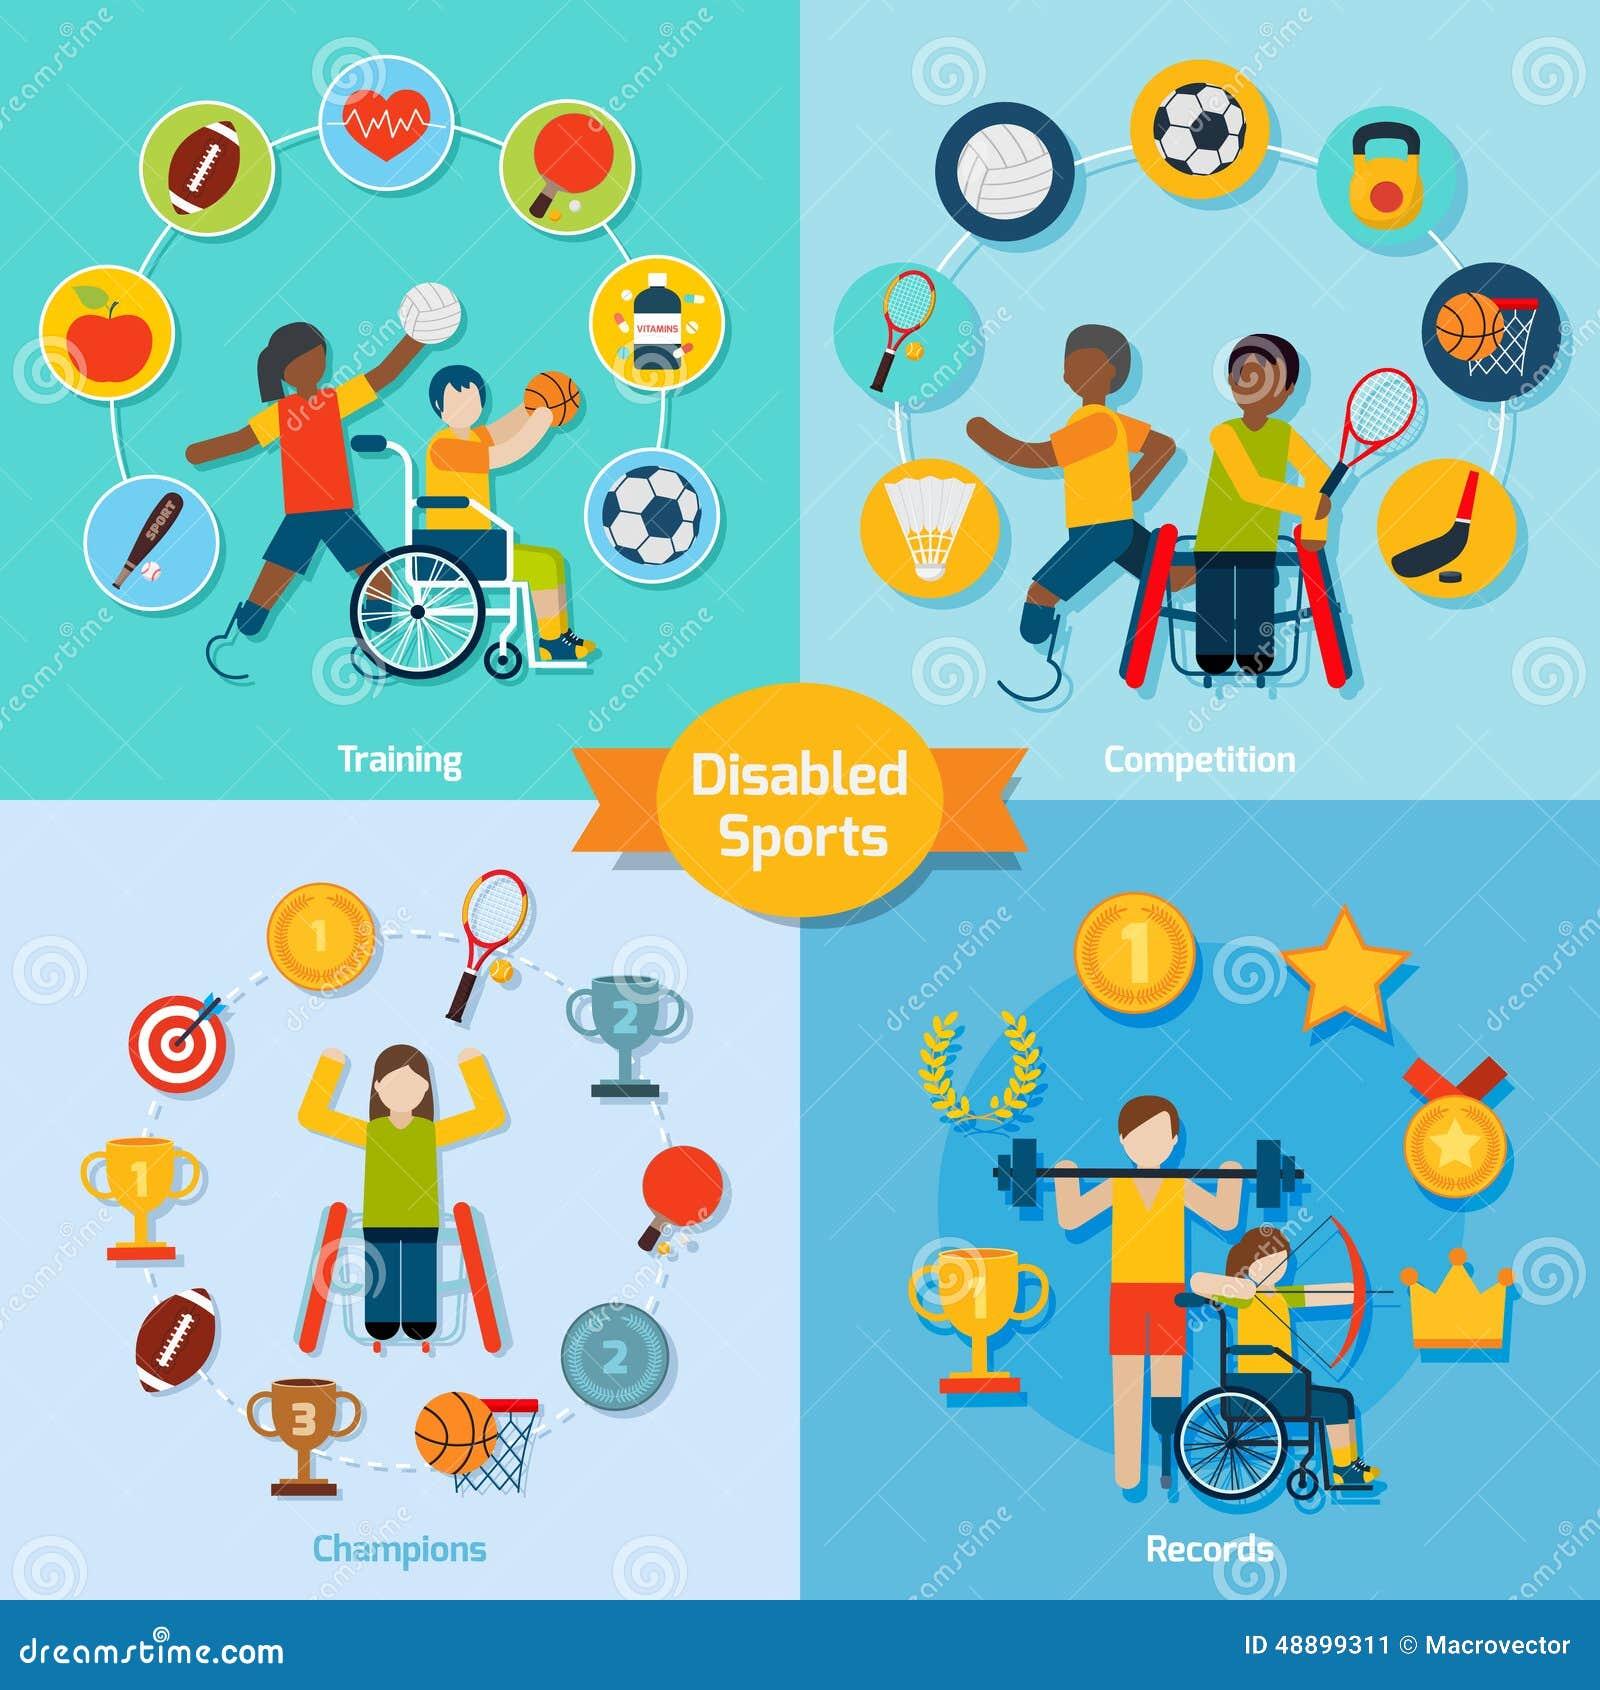 Disabled Handicapped People Flat Icons Set Cartoon Vector | CartoonDealer.com #68494295